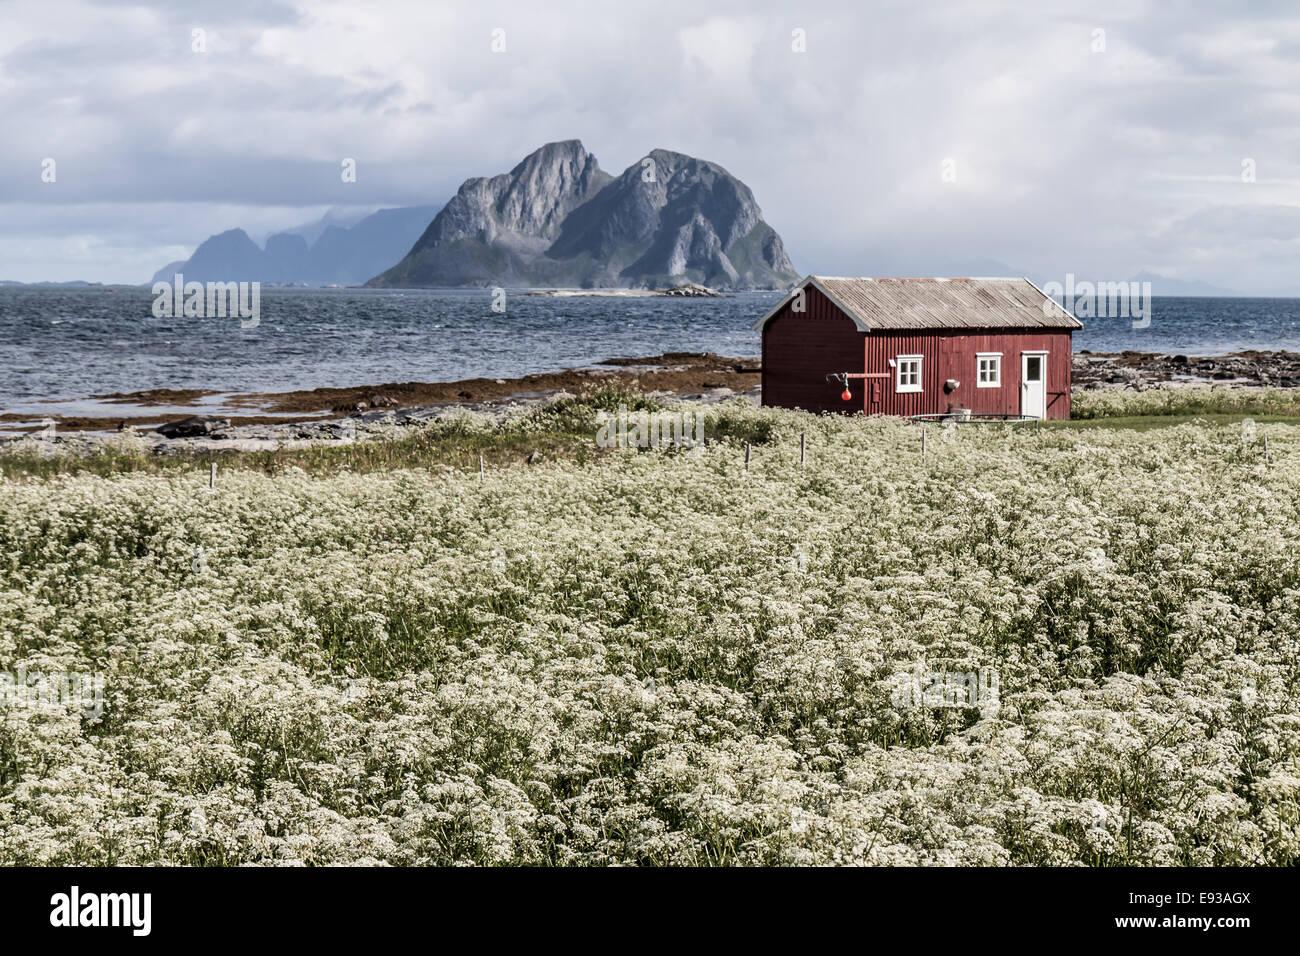 Vaeroy island, Lofoten island,Norway - Stock Image